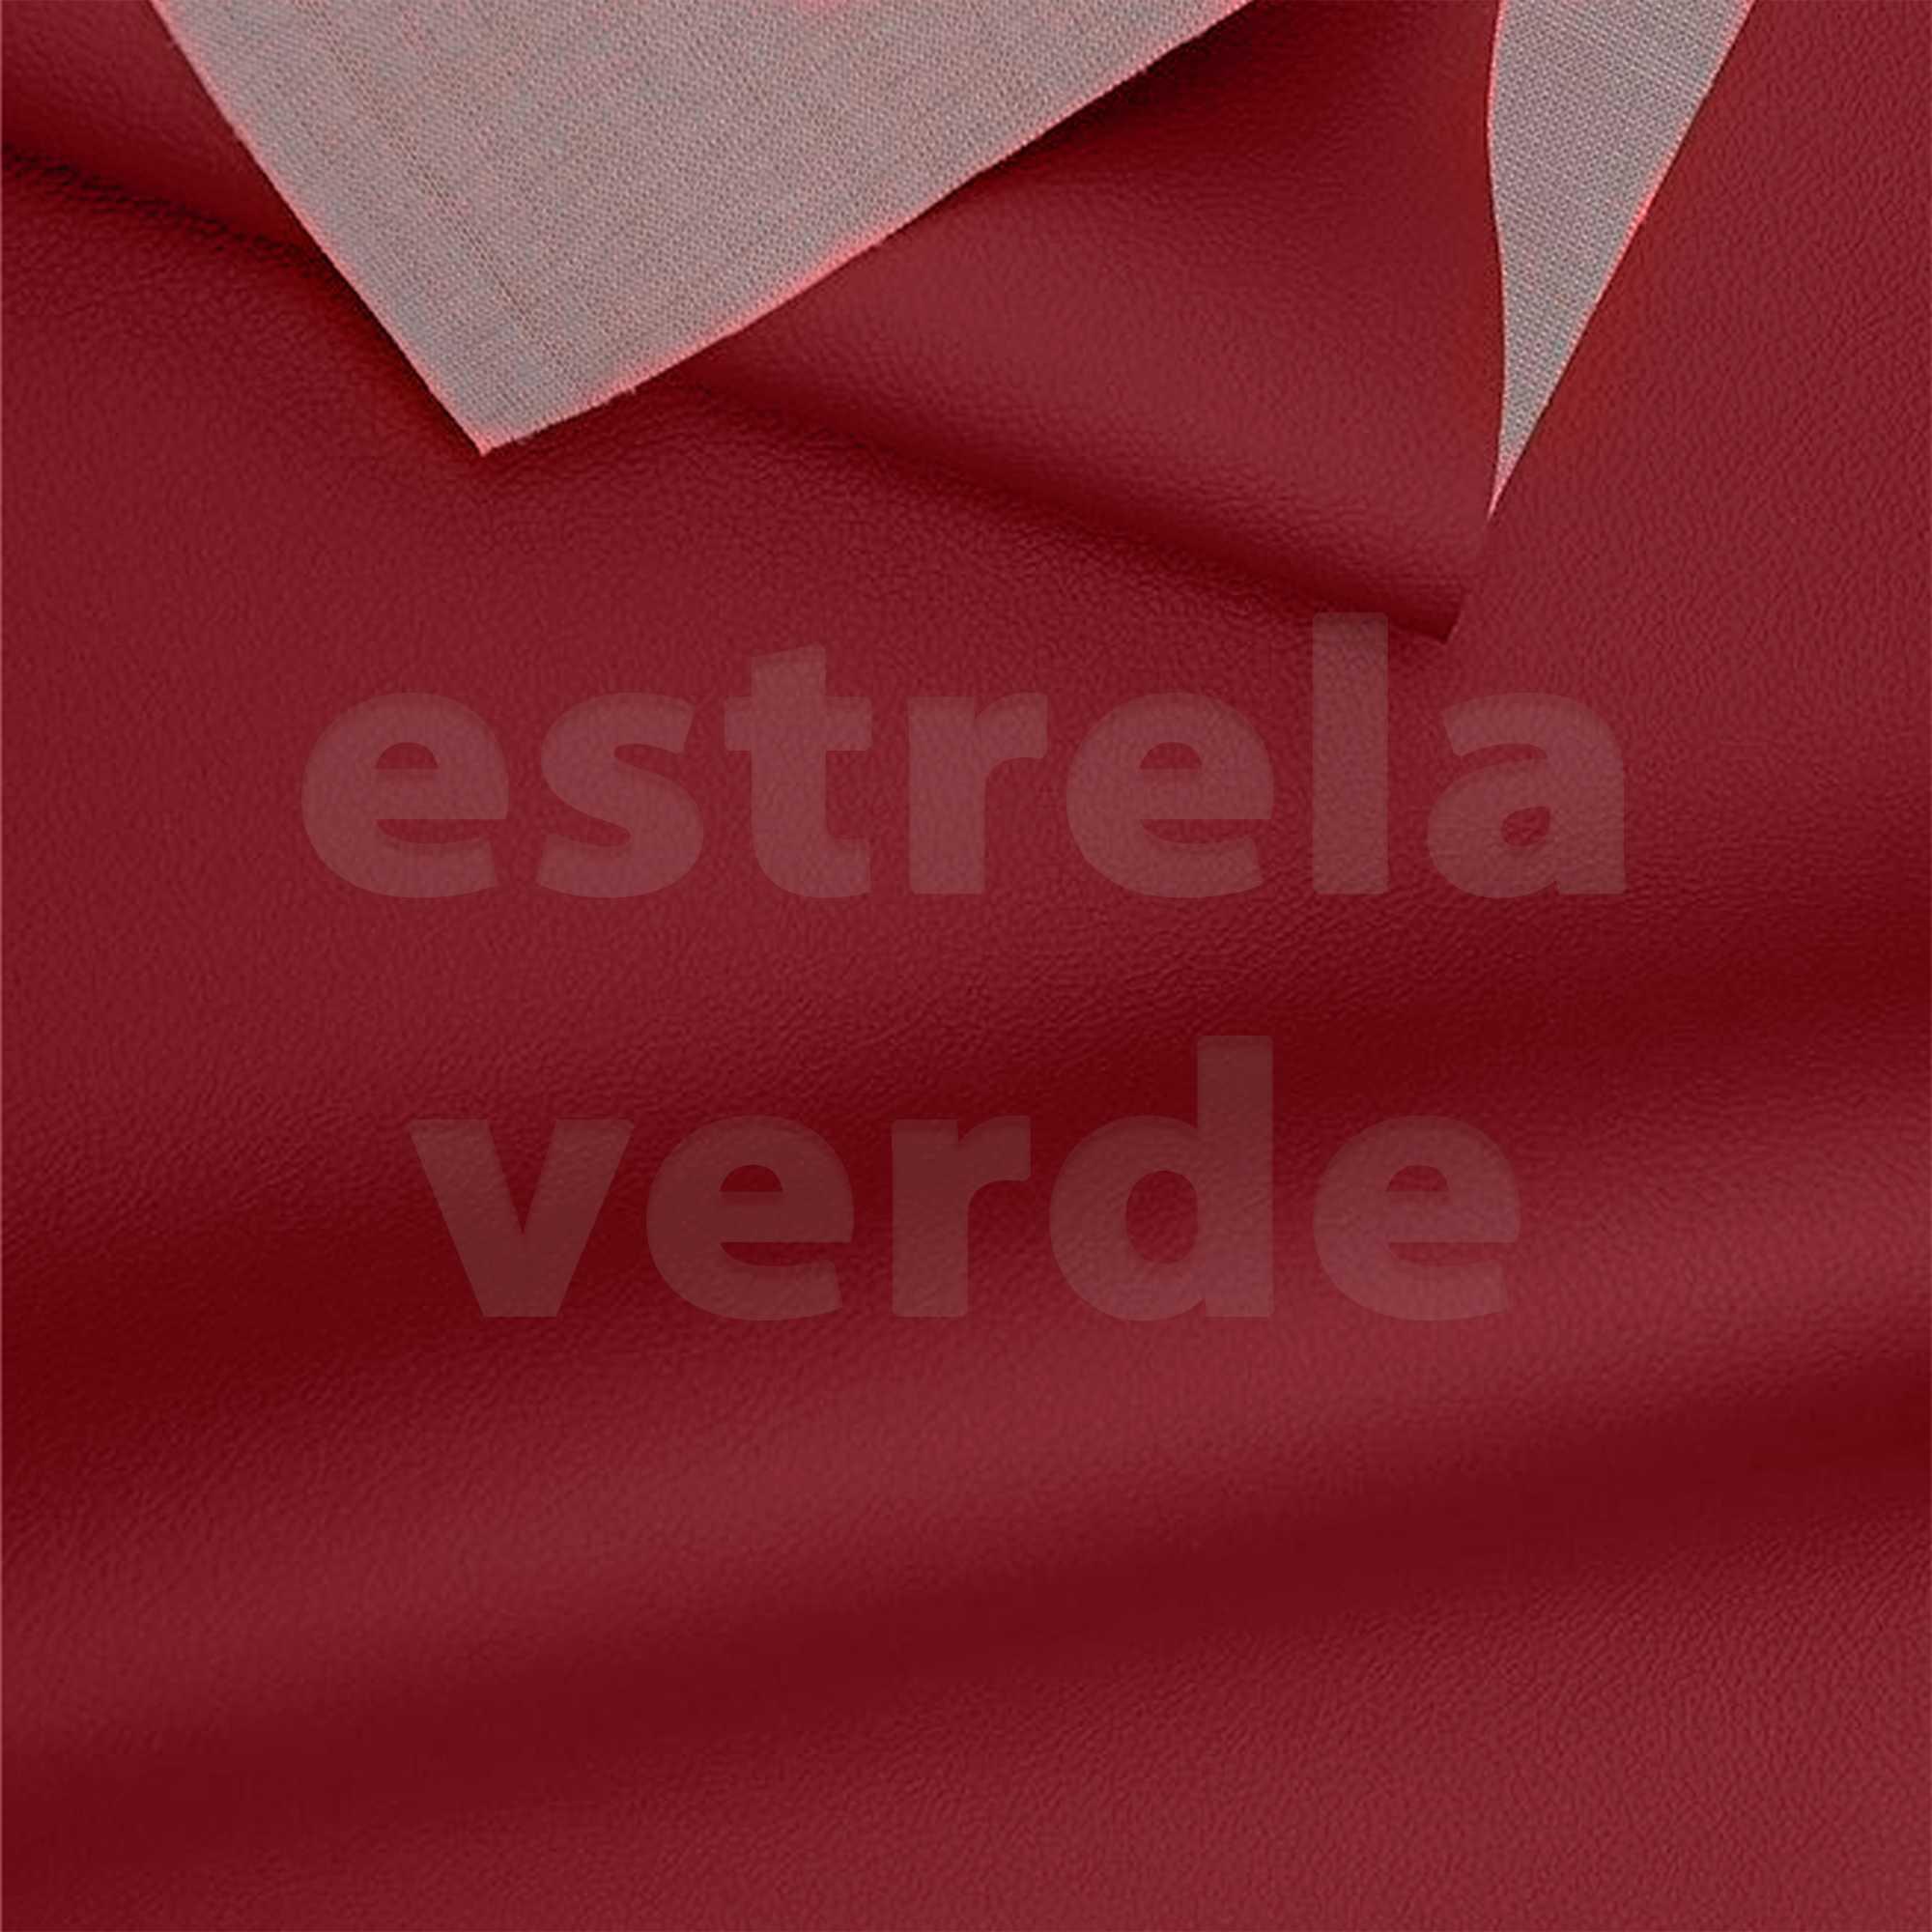 COURVIN AUTO 1.0 URUGUAI  - Estrela Verde